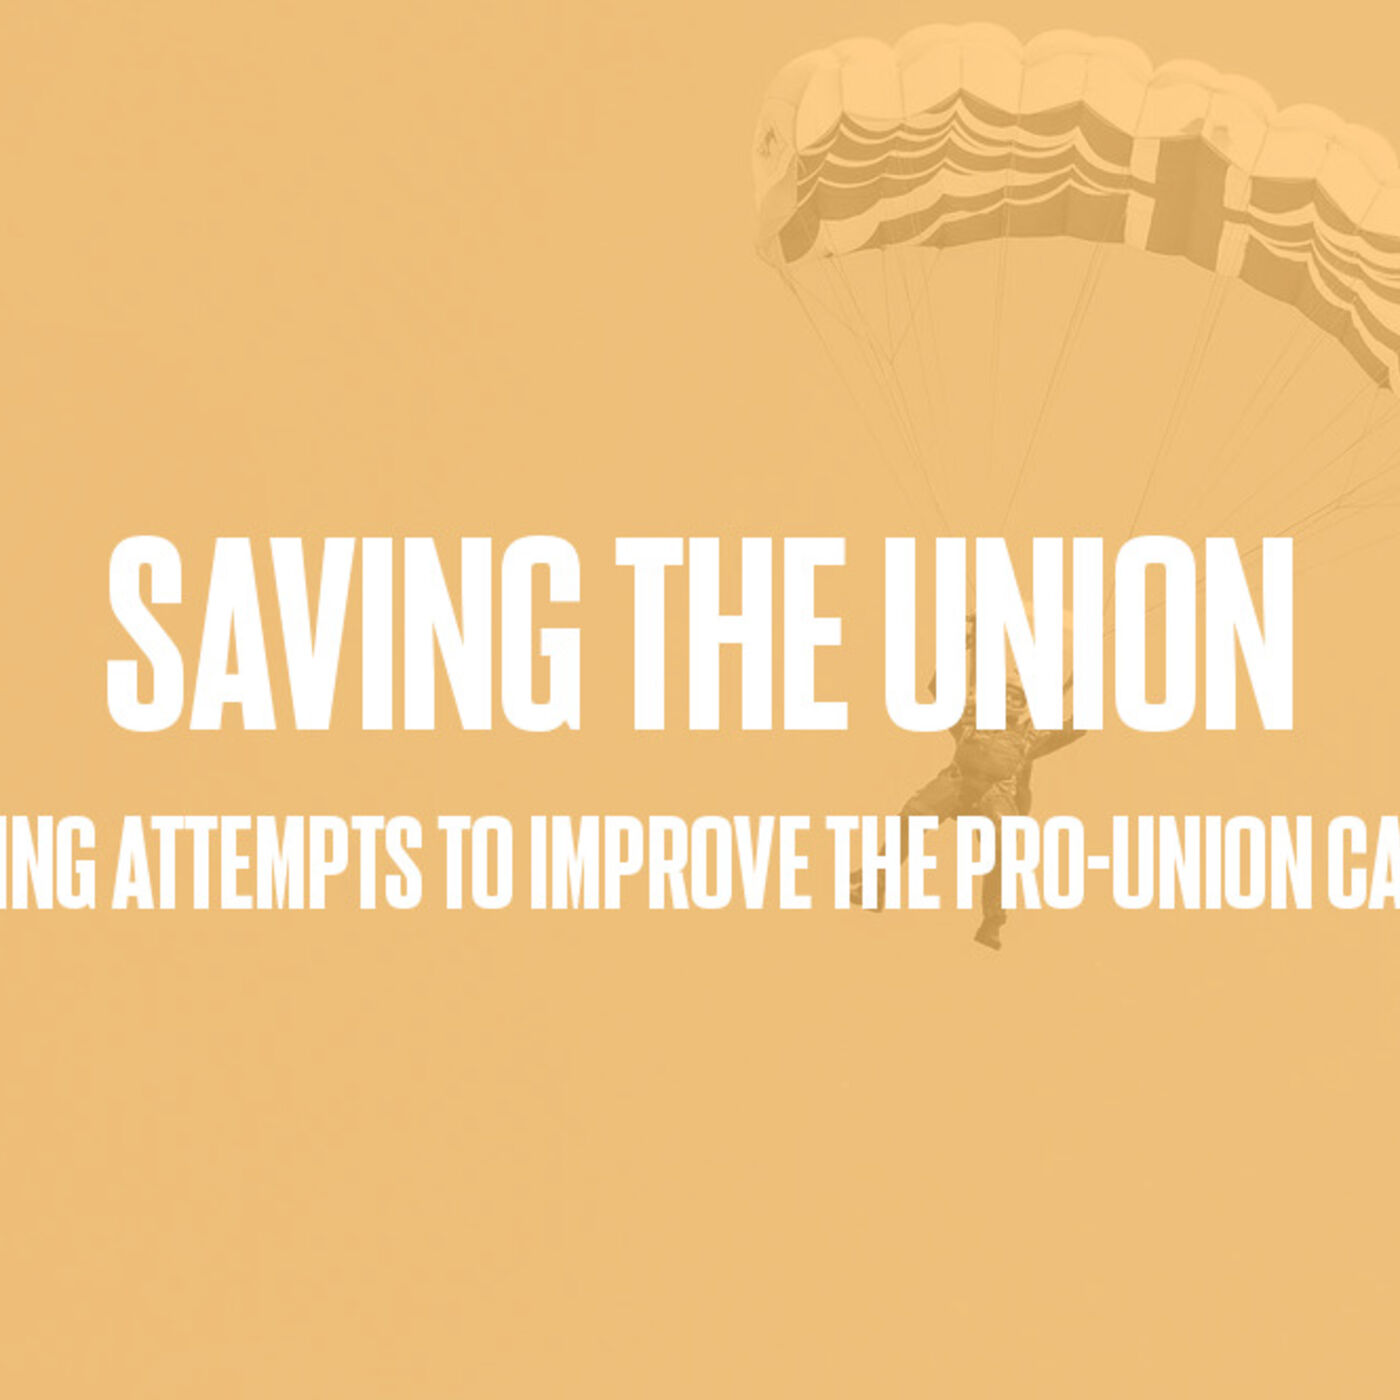 Episode #54 - Saving The Union